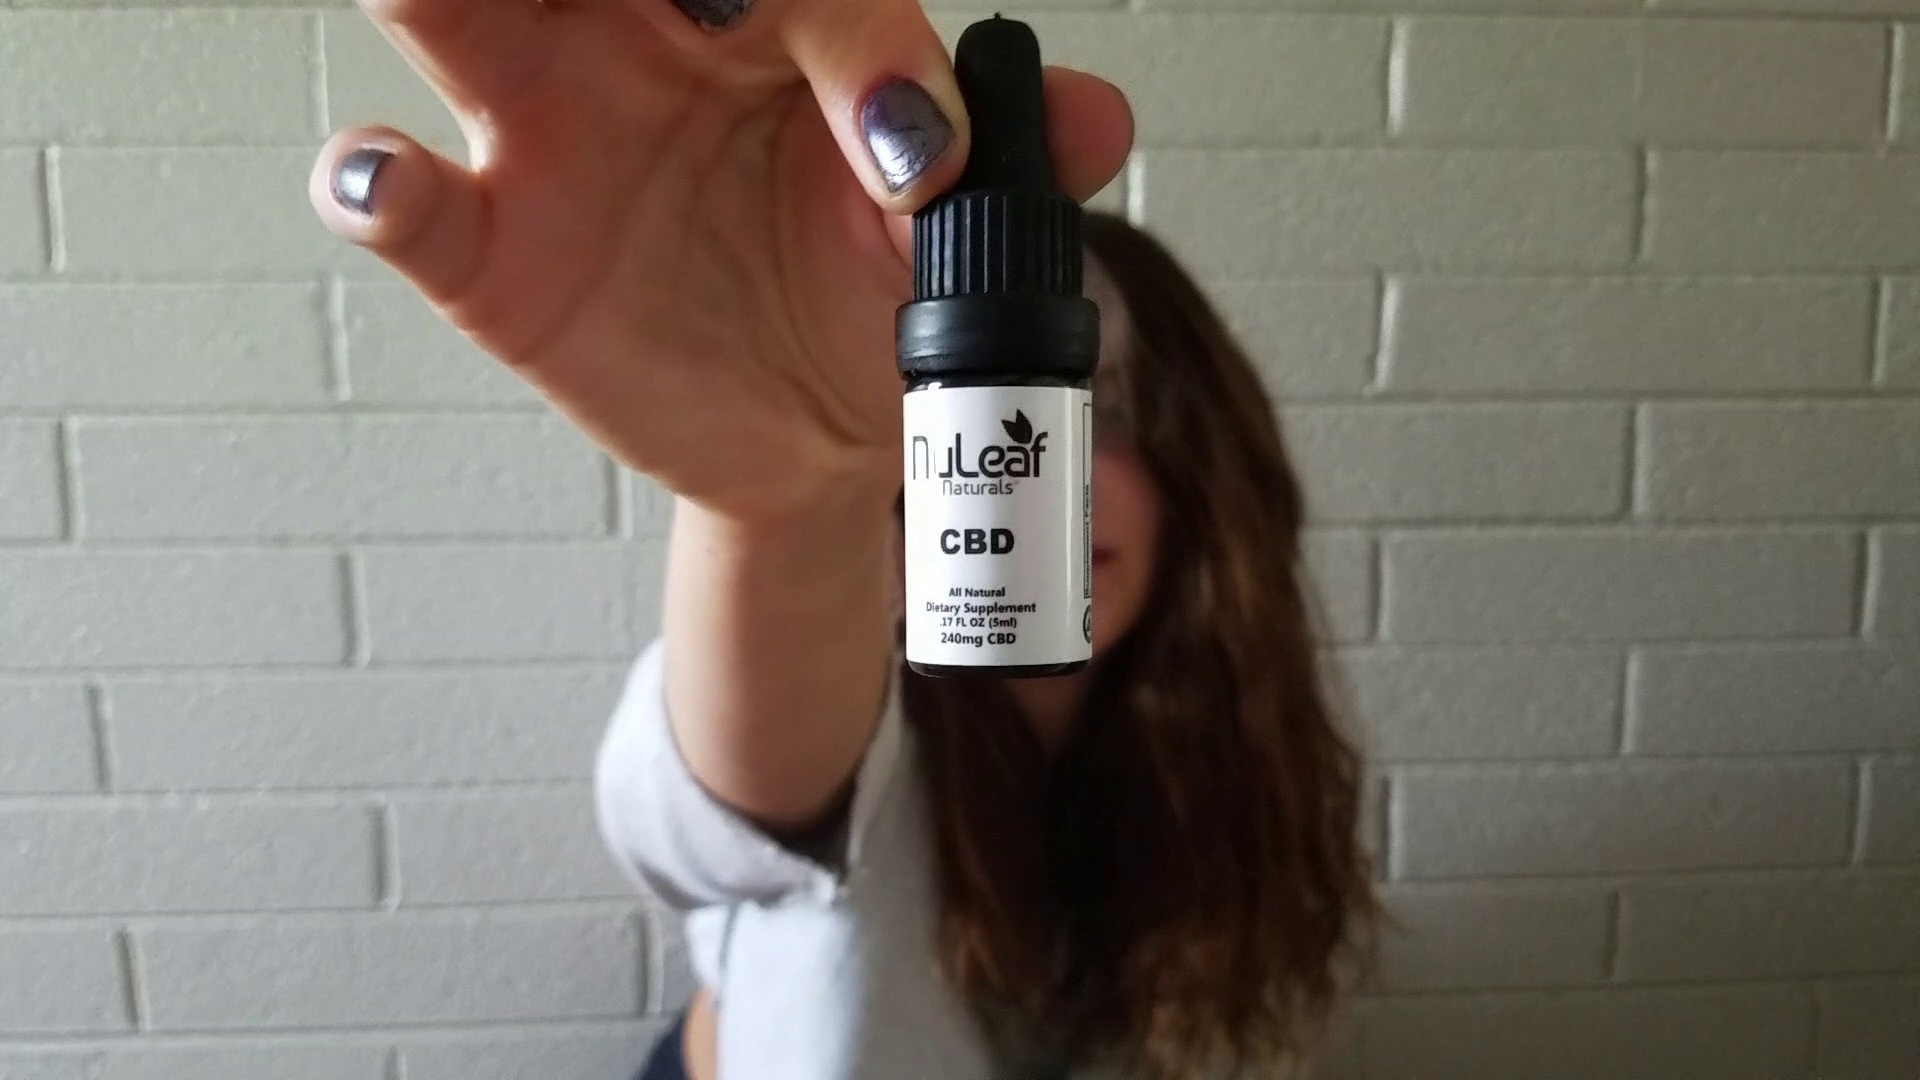 Nuleaf CBD oil VS Elixinol CBD oil